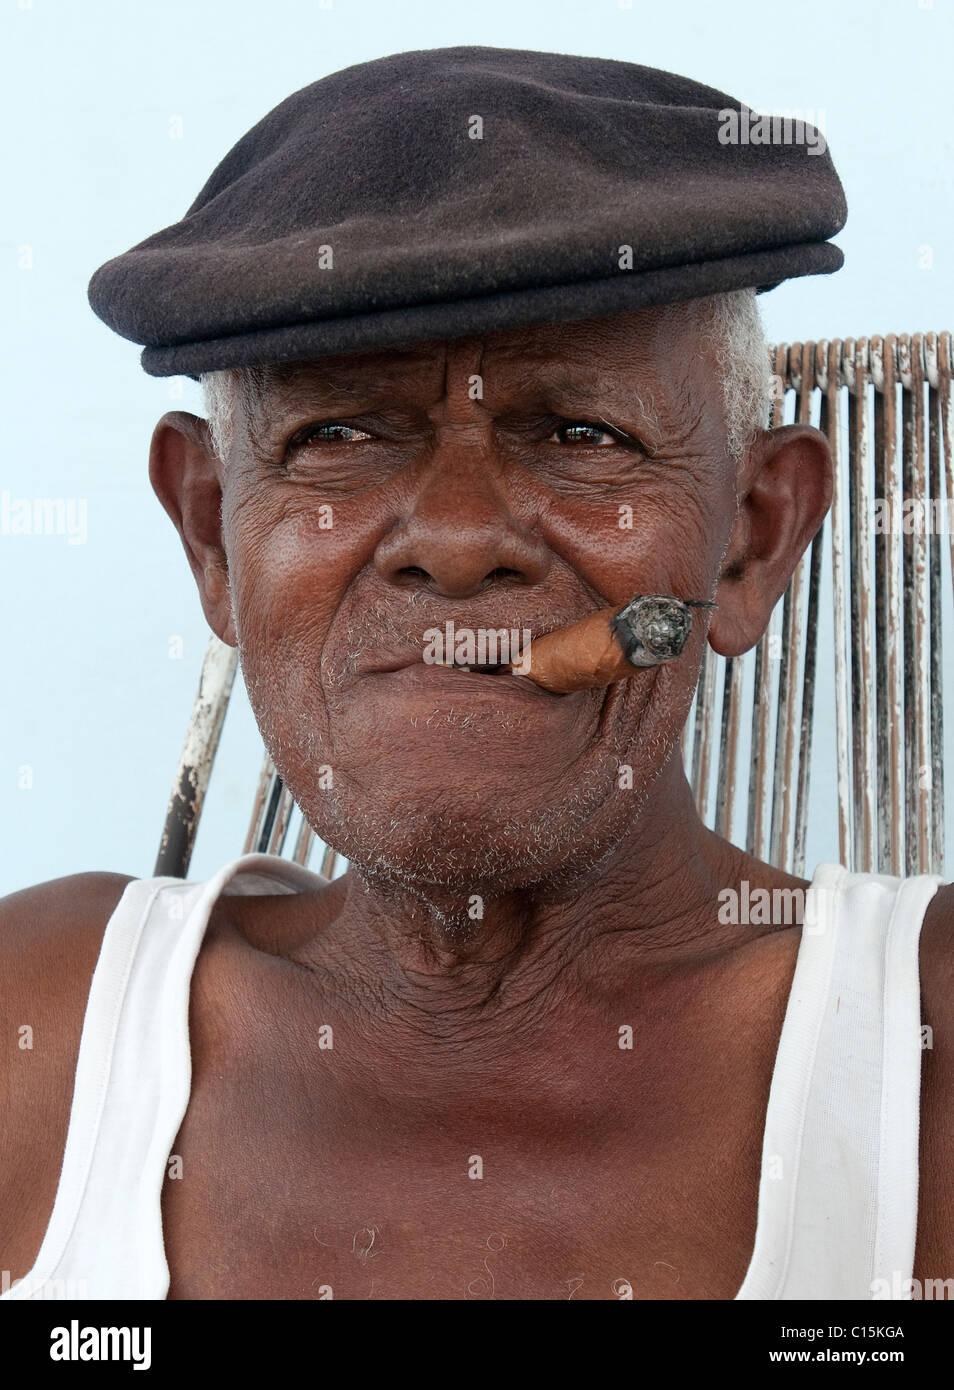 Elderly Cuban with cigar, Cuba - Stock Image